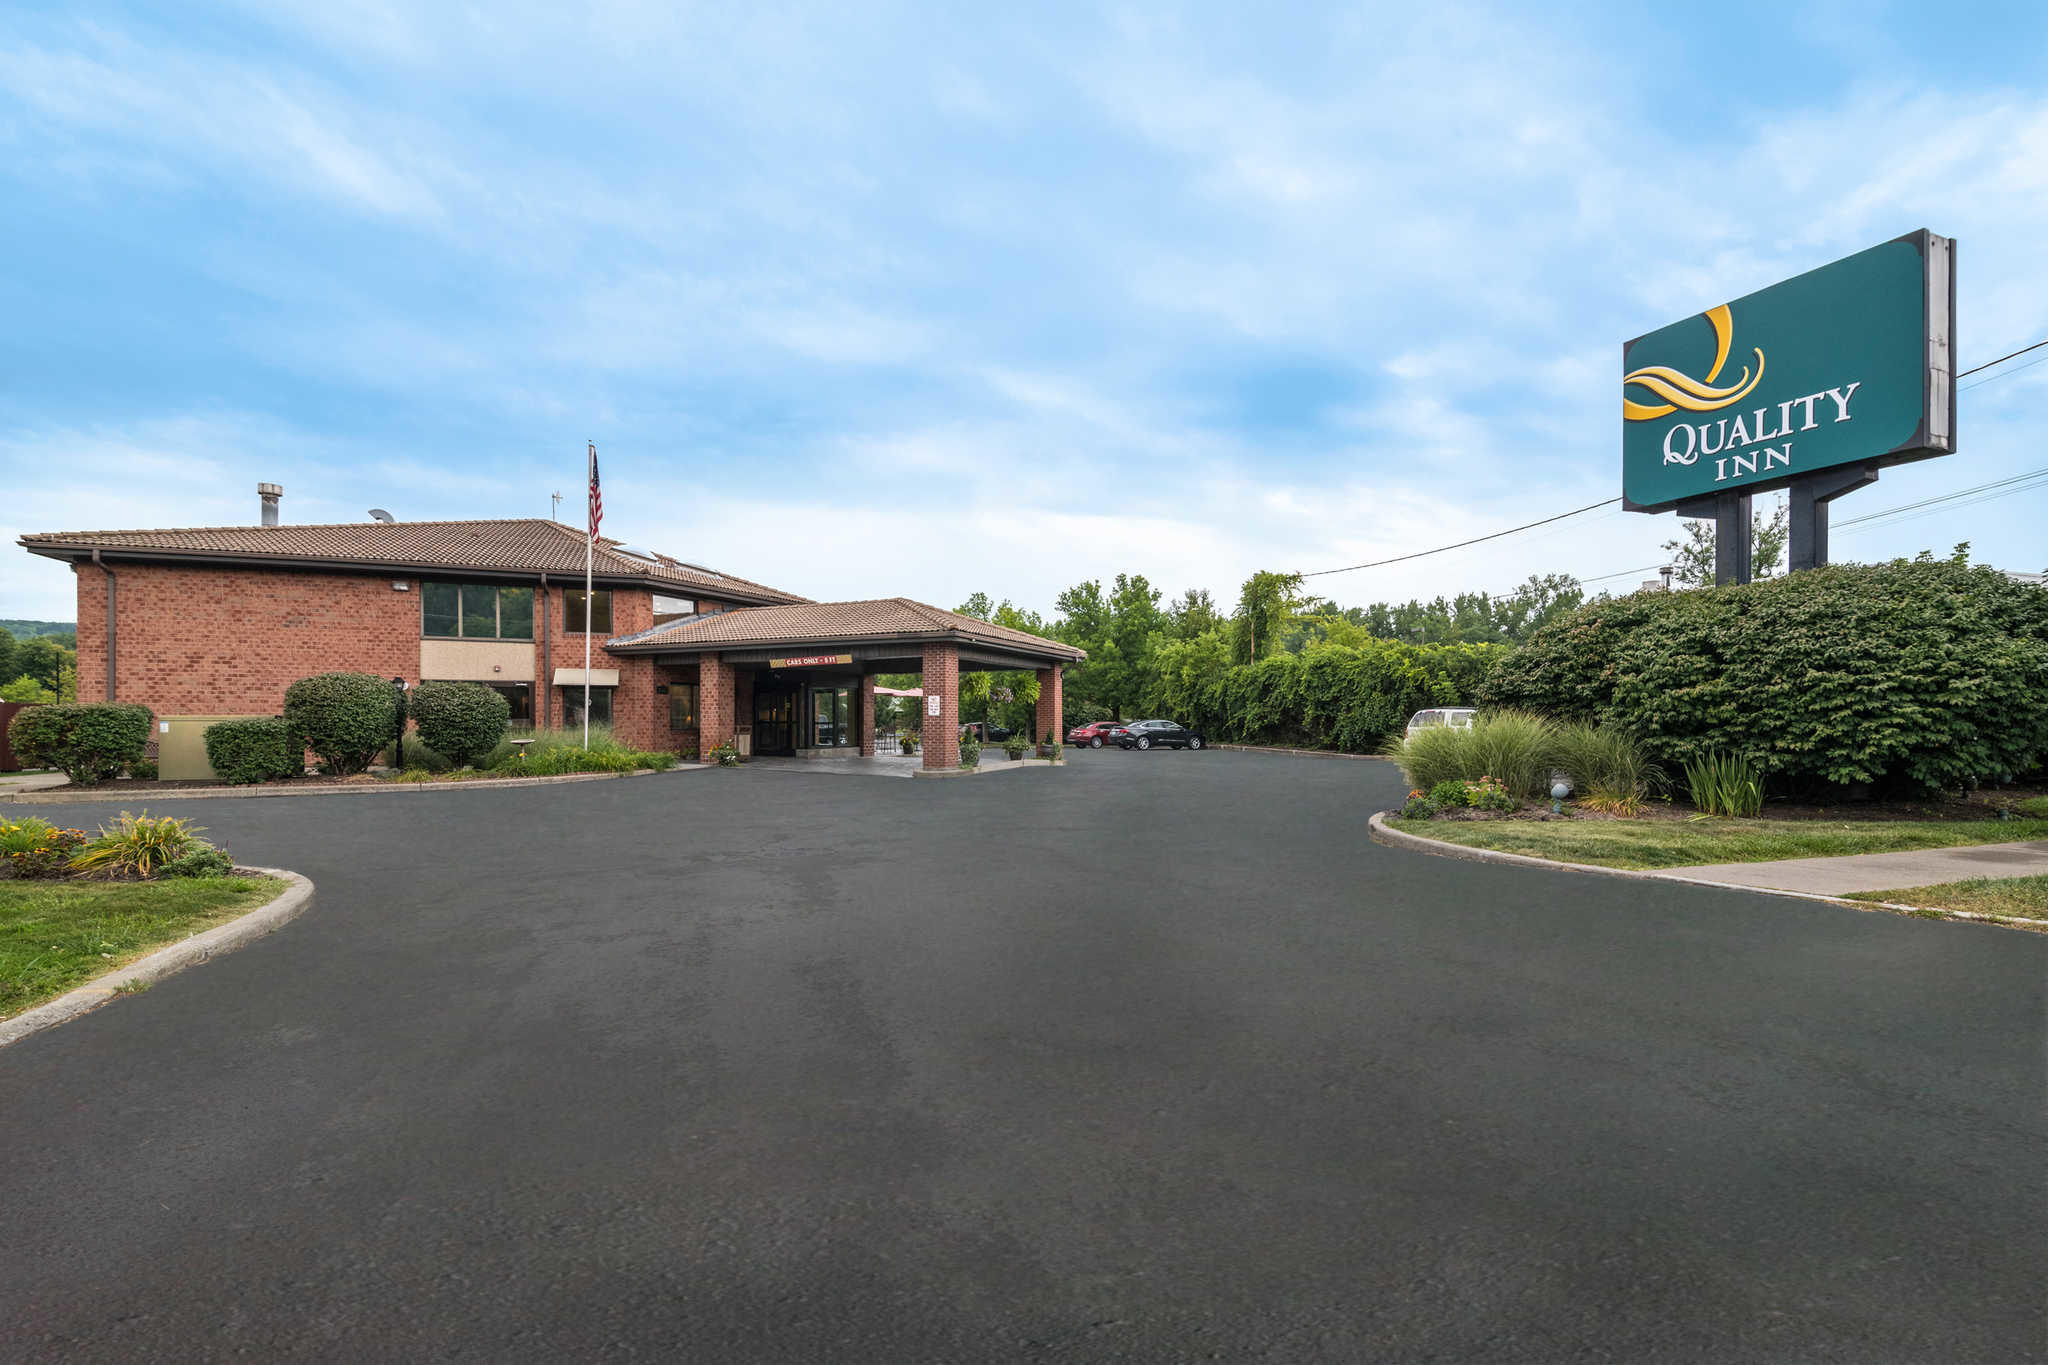 Quality Inn Ithaca - University Area image 0